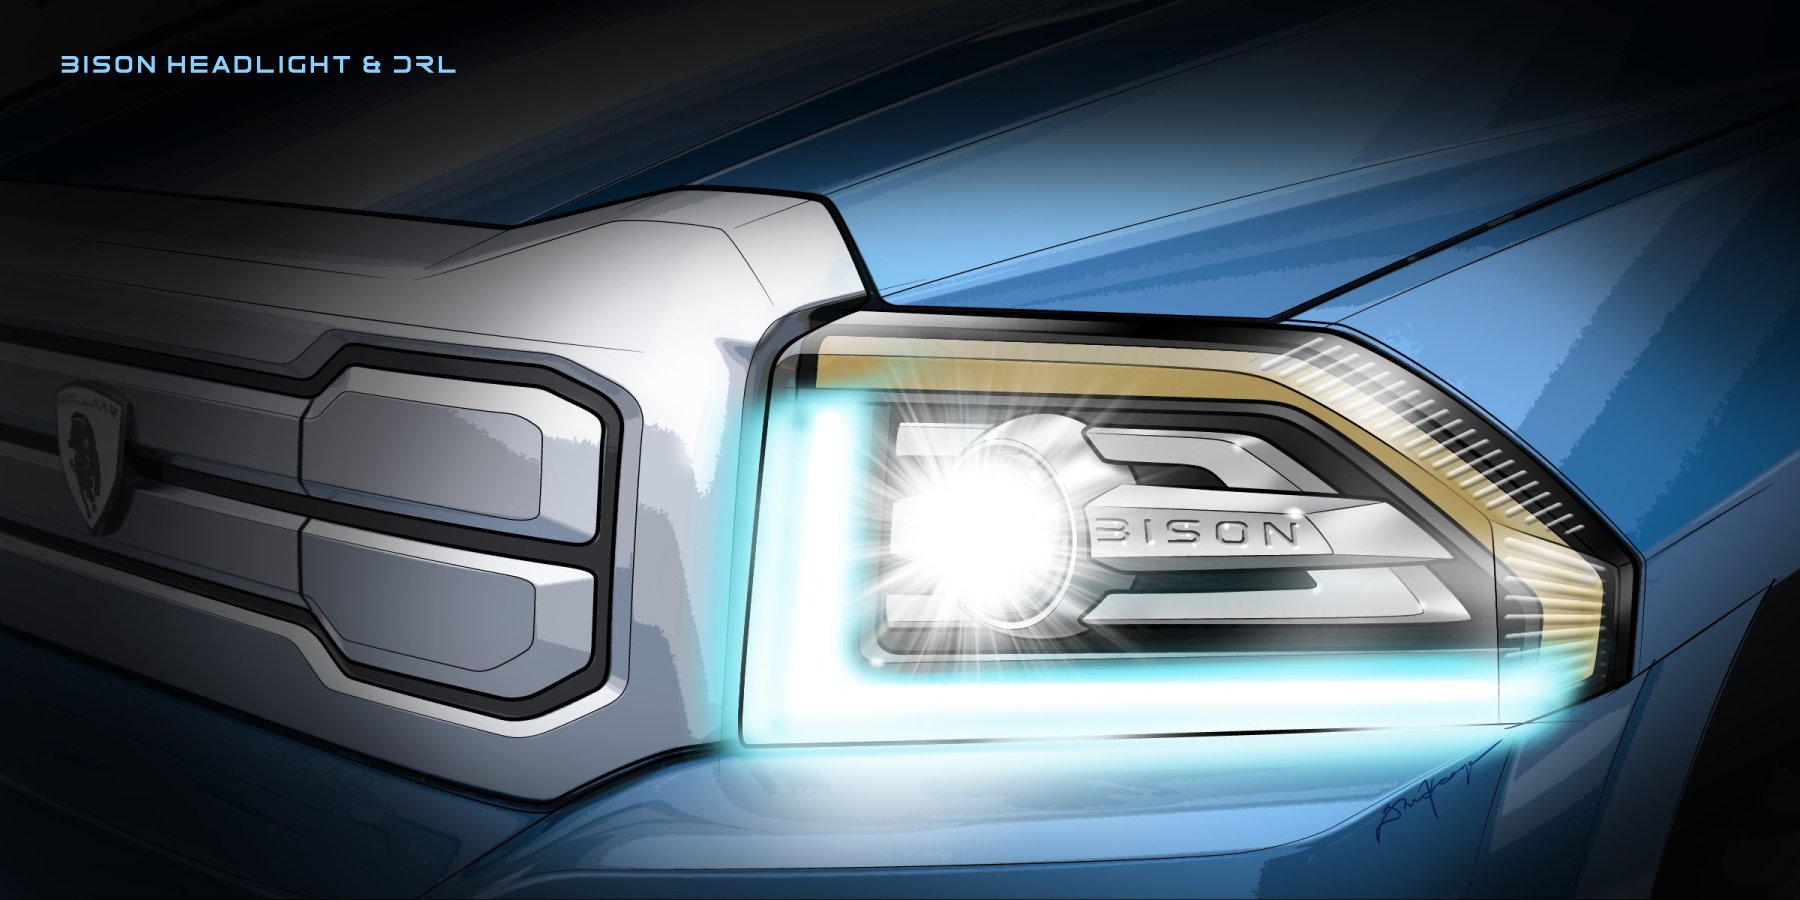 Havelaar-Bison headlights Keage Concepts Calgary Alberta Automotive Design